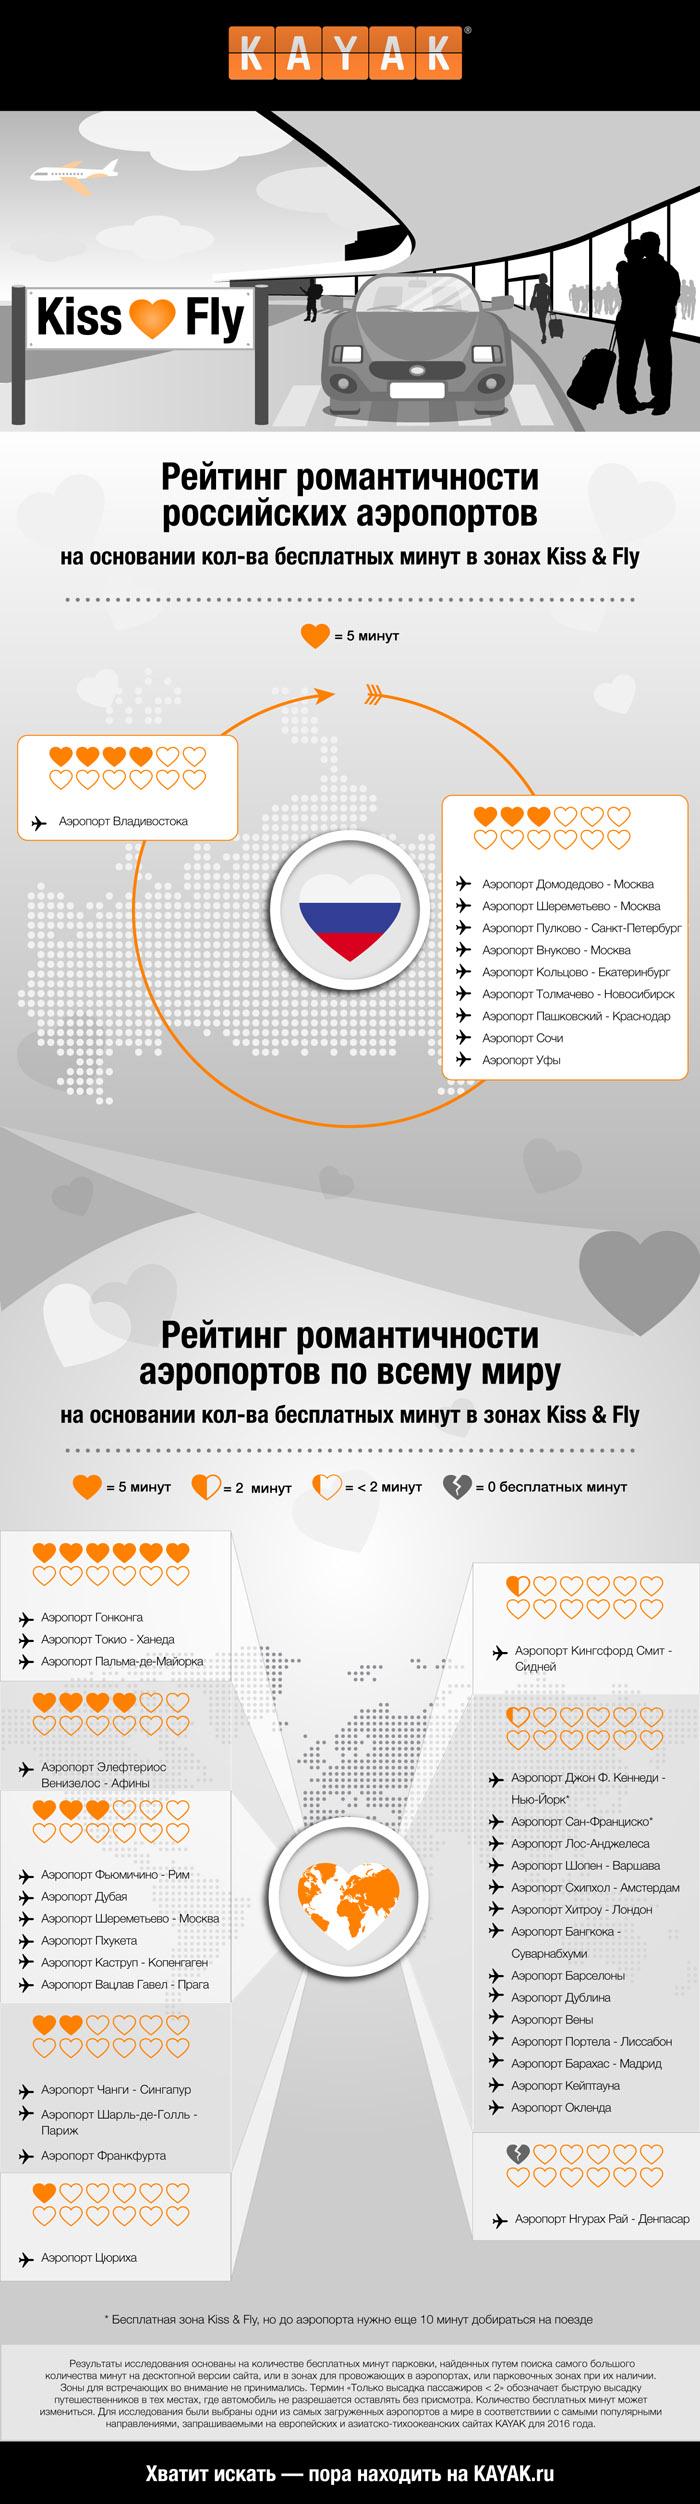 KAYAK.ru �������� ������ ����� ������������� ���������� �� ����� ����.